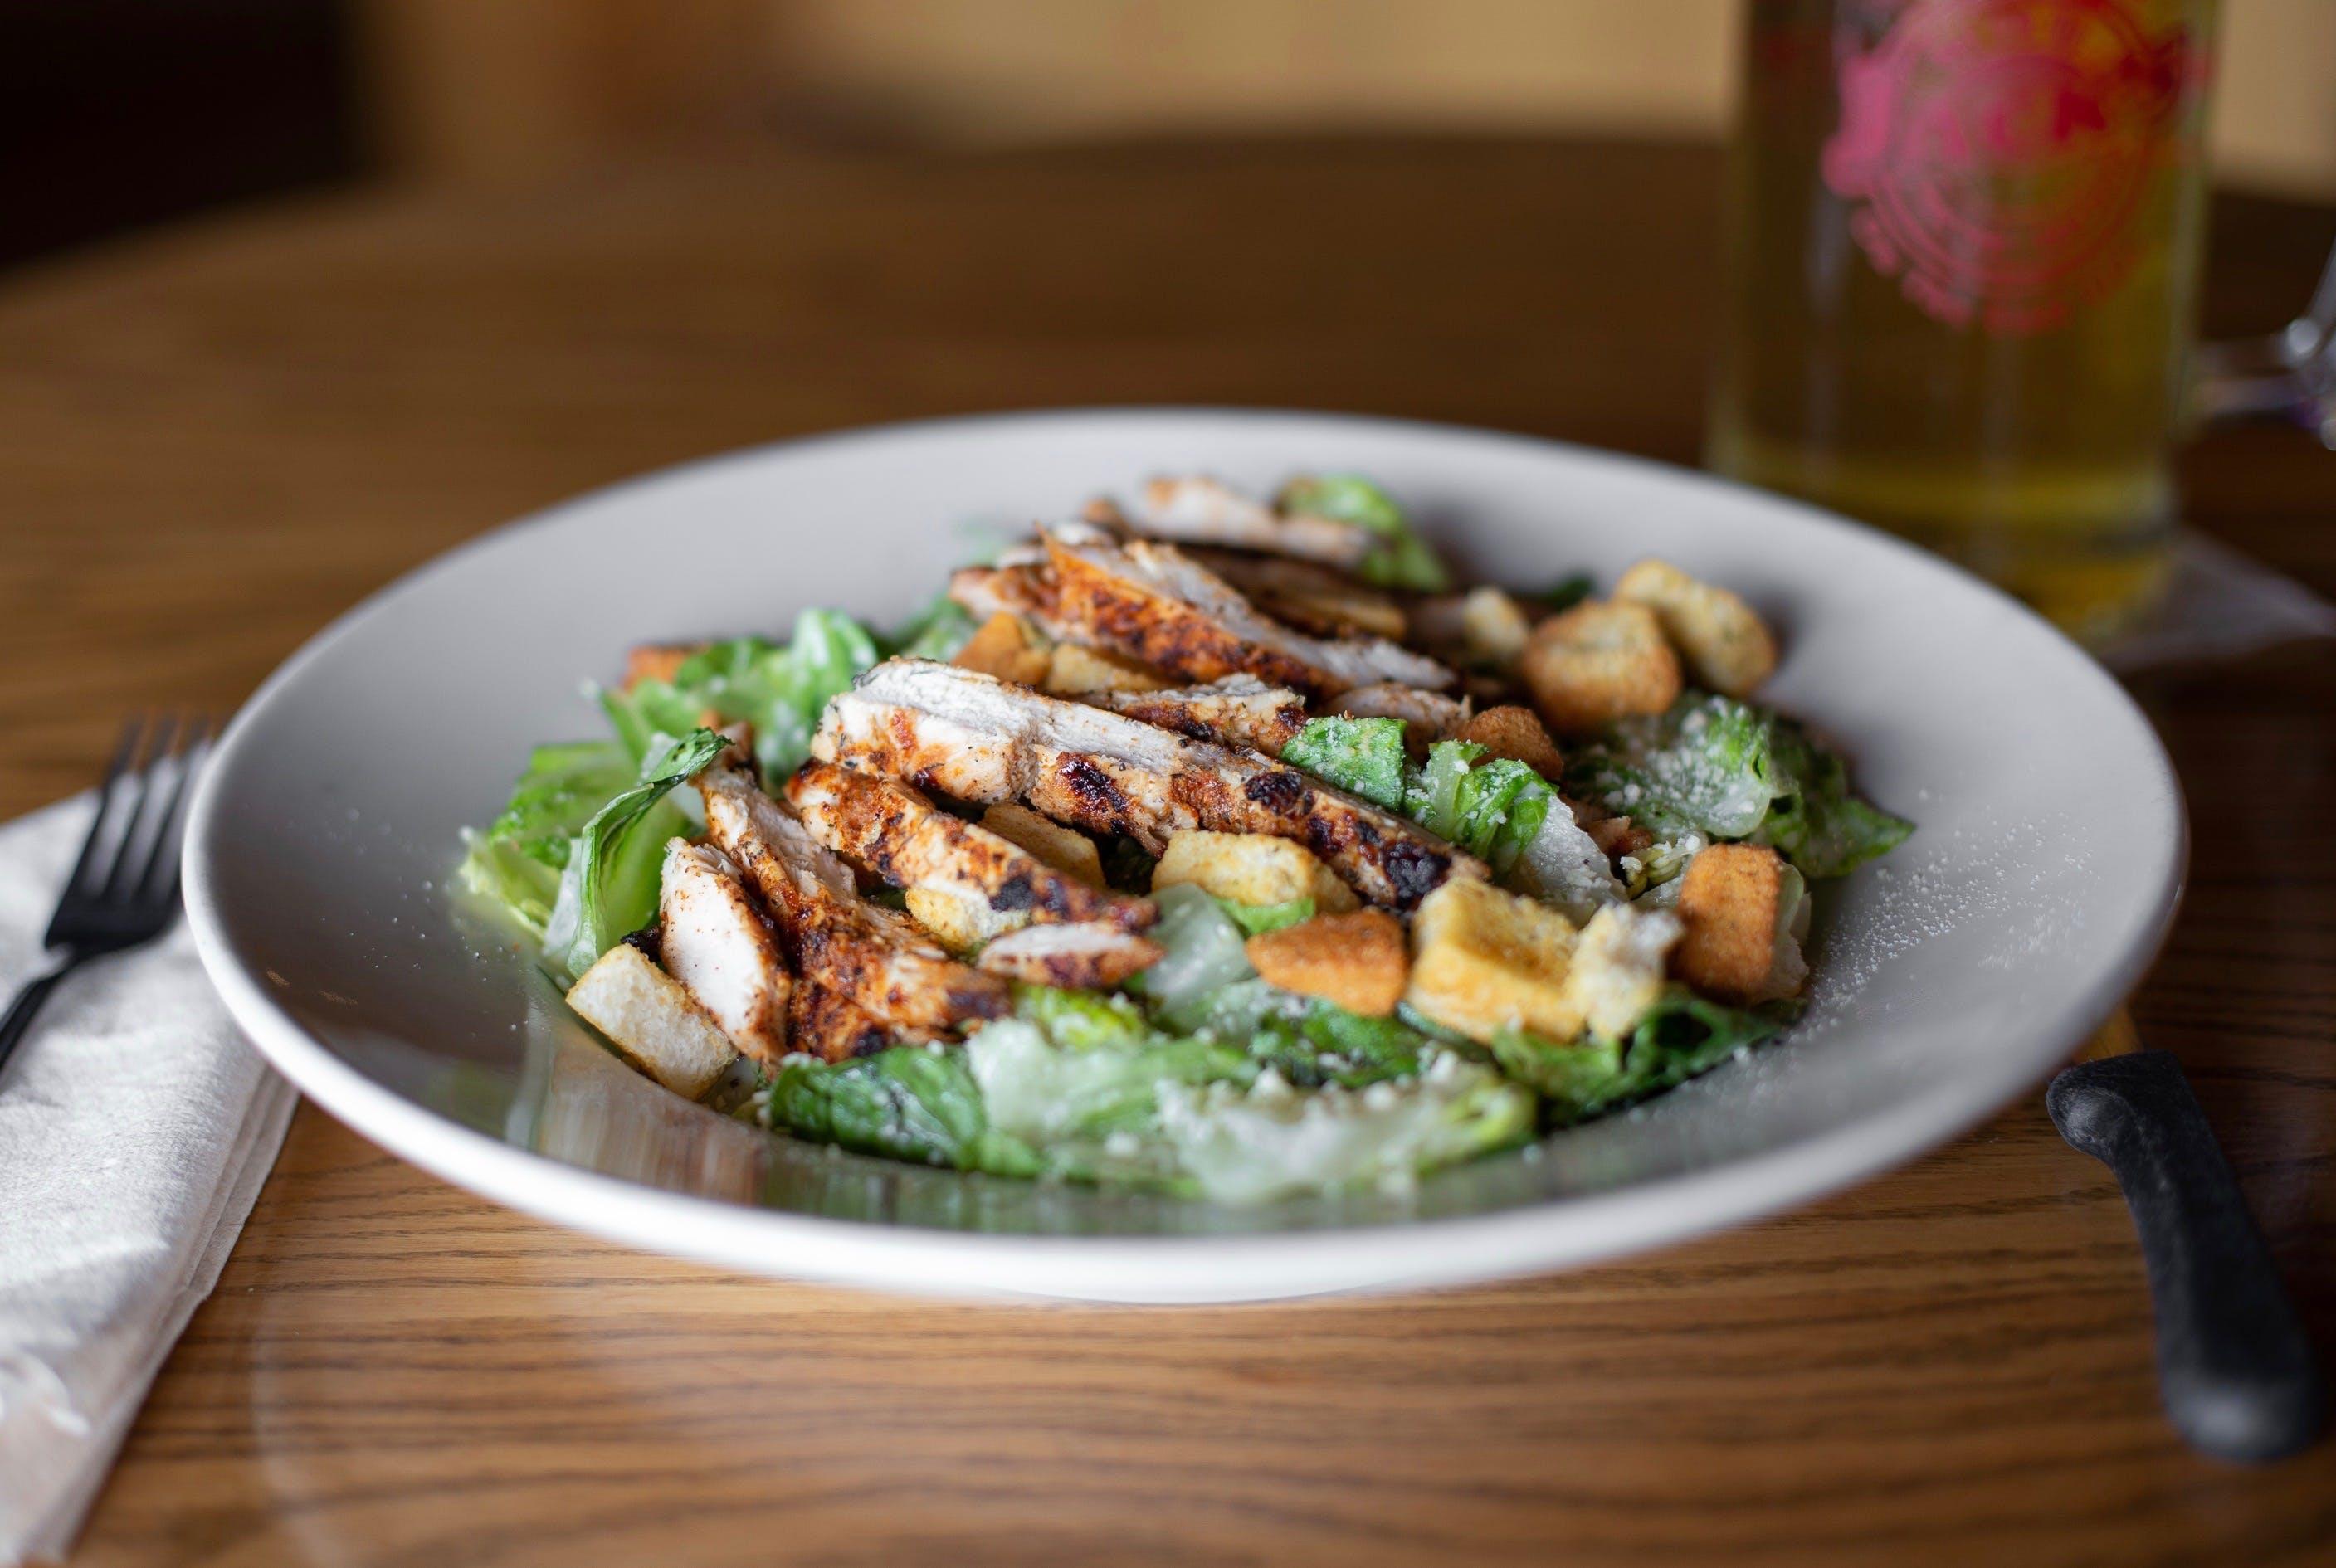 Caesar's Choice Salad from Set'em Up Jacks in Lawrence, KS